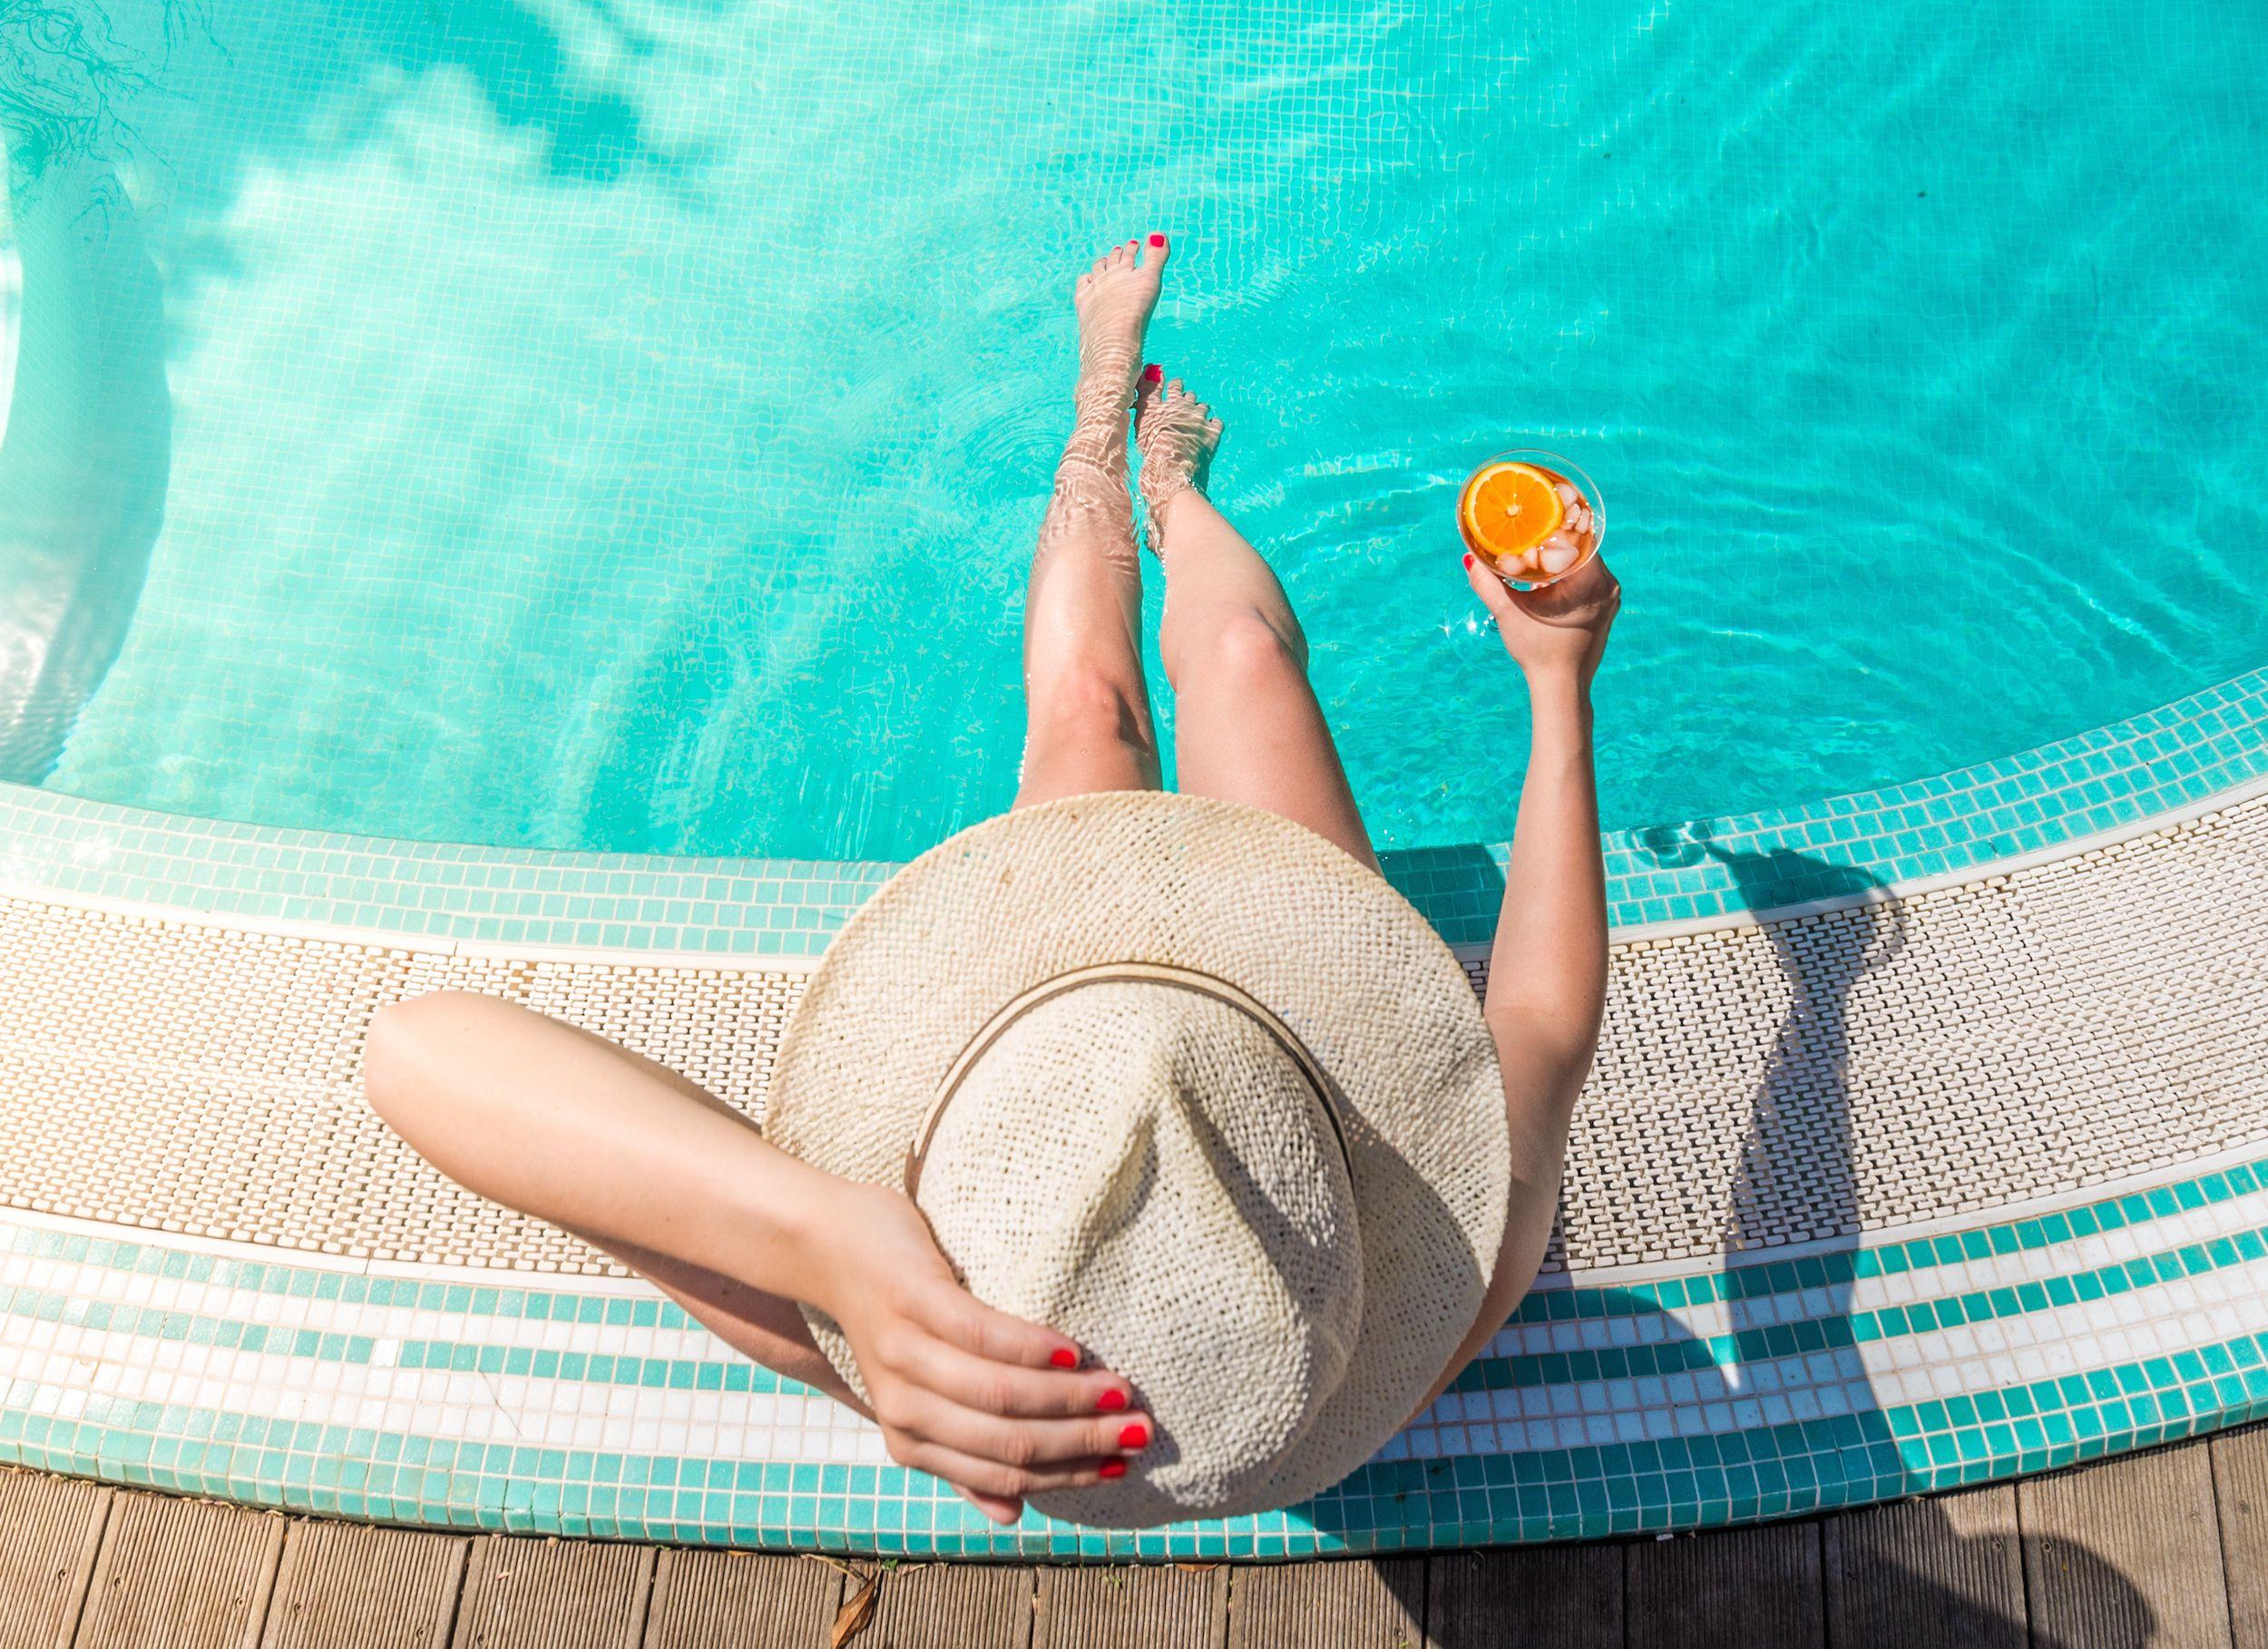 b3b3d6496 25 Best Sun Hats for Summer 2019 - Floppy, Woven Straw, More